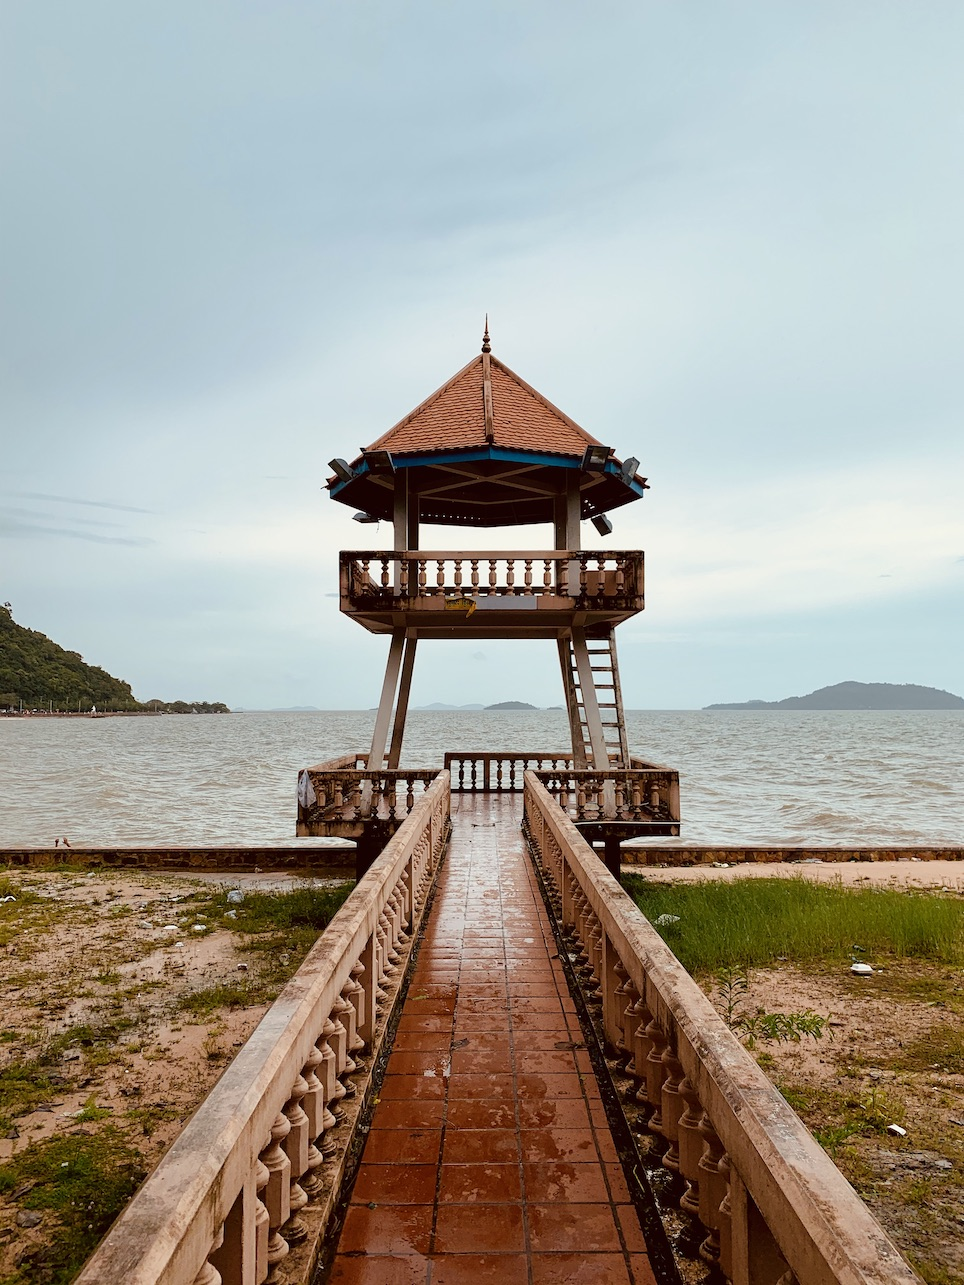 Gazebo Chhak Kep Bay Cambodia.